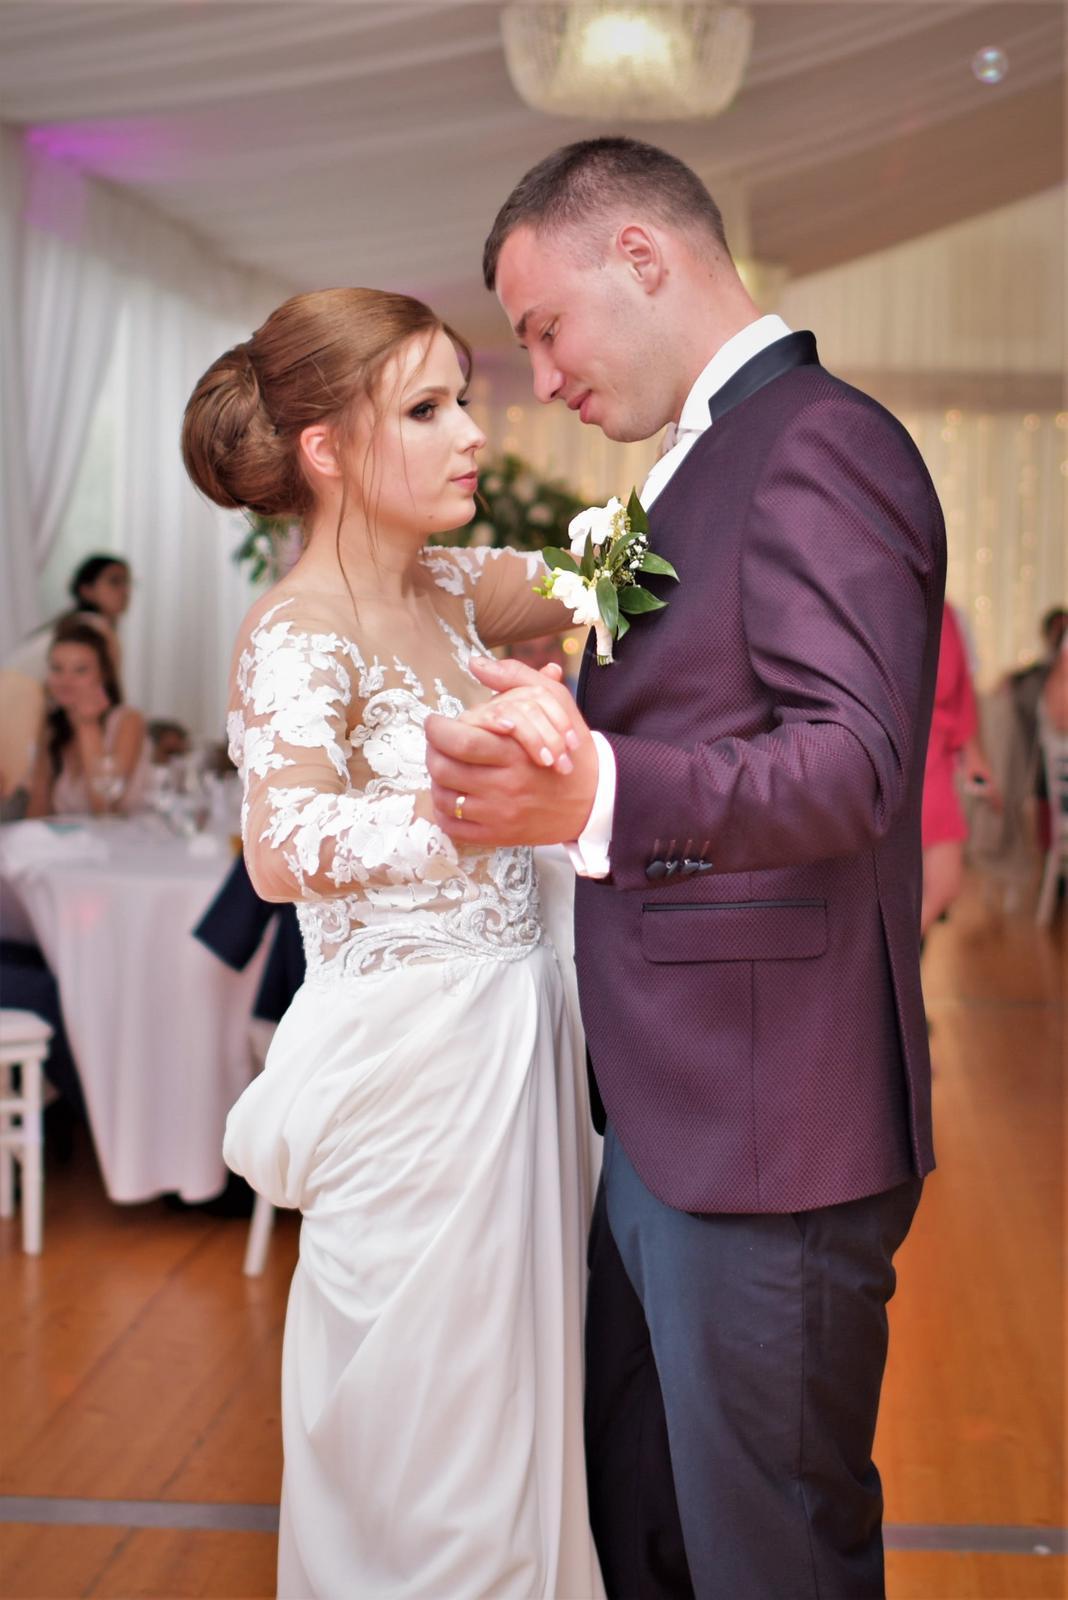 DJ + Fotografka na Vašu svadbu, Penzion Rosenthal, Ružindol - Obrázok č. 2